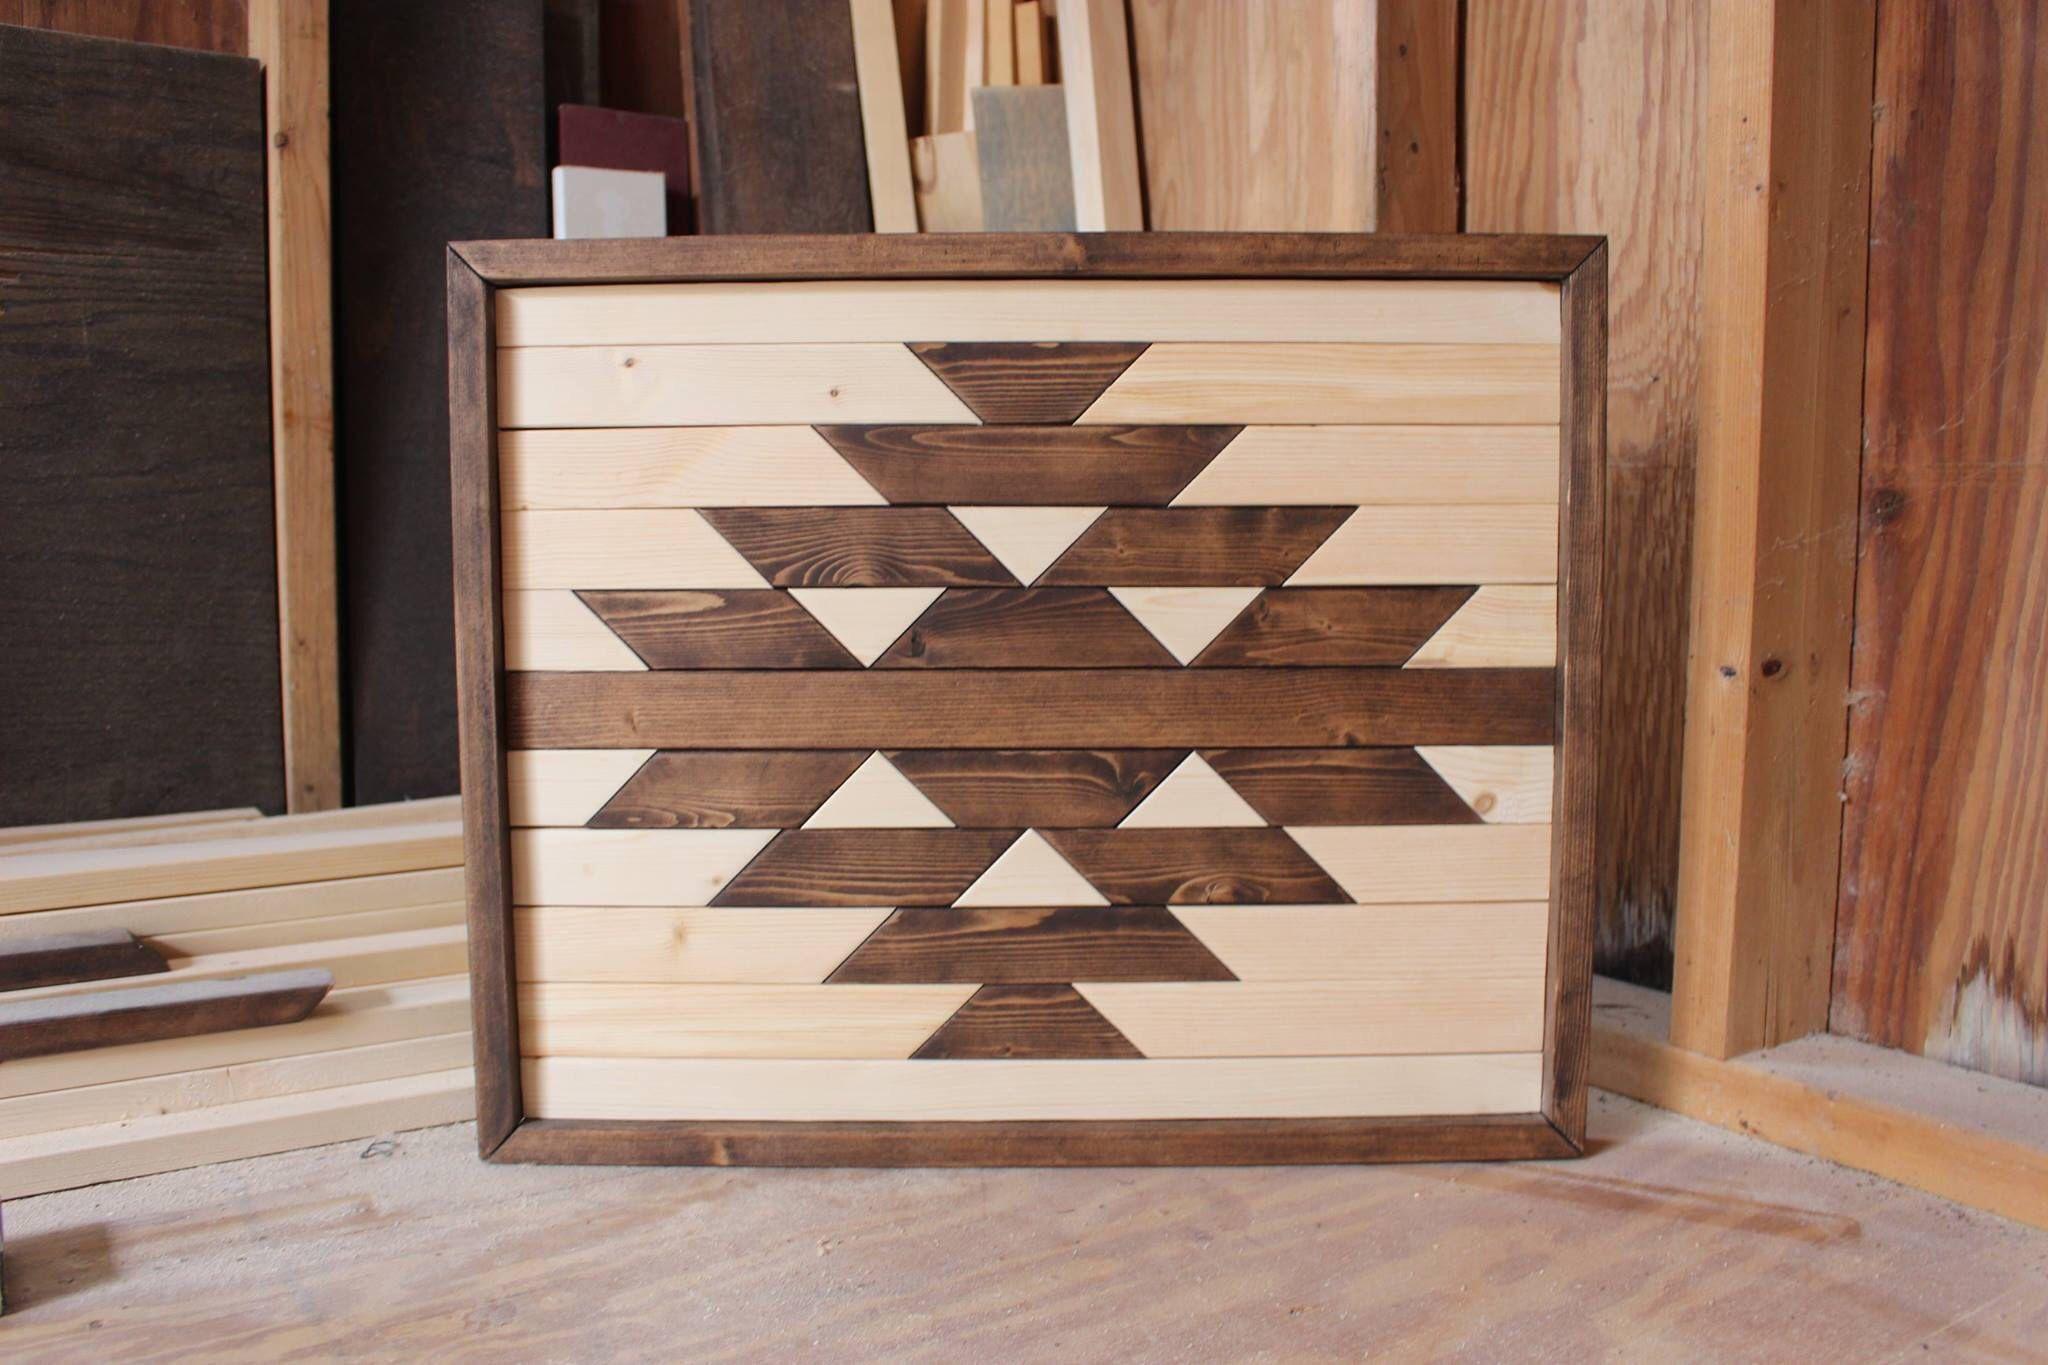 Modern wood artwood wall artgeometric wood artreclaimed wood wall